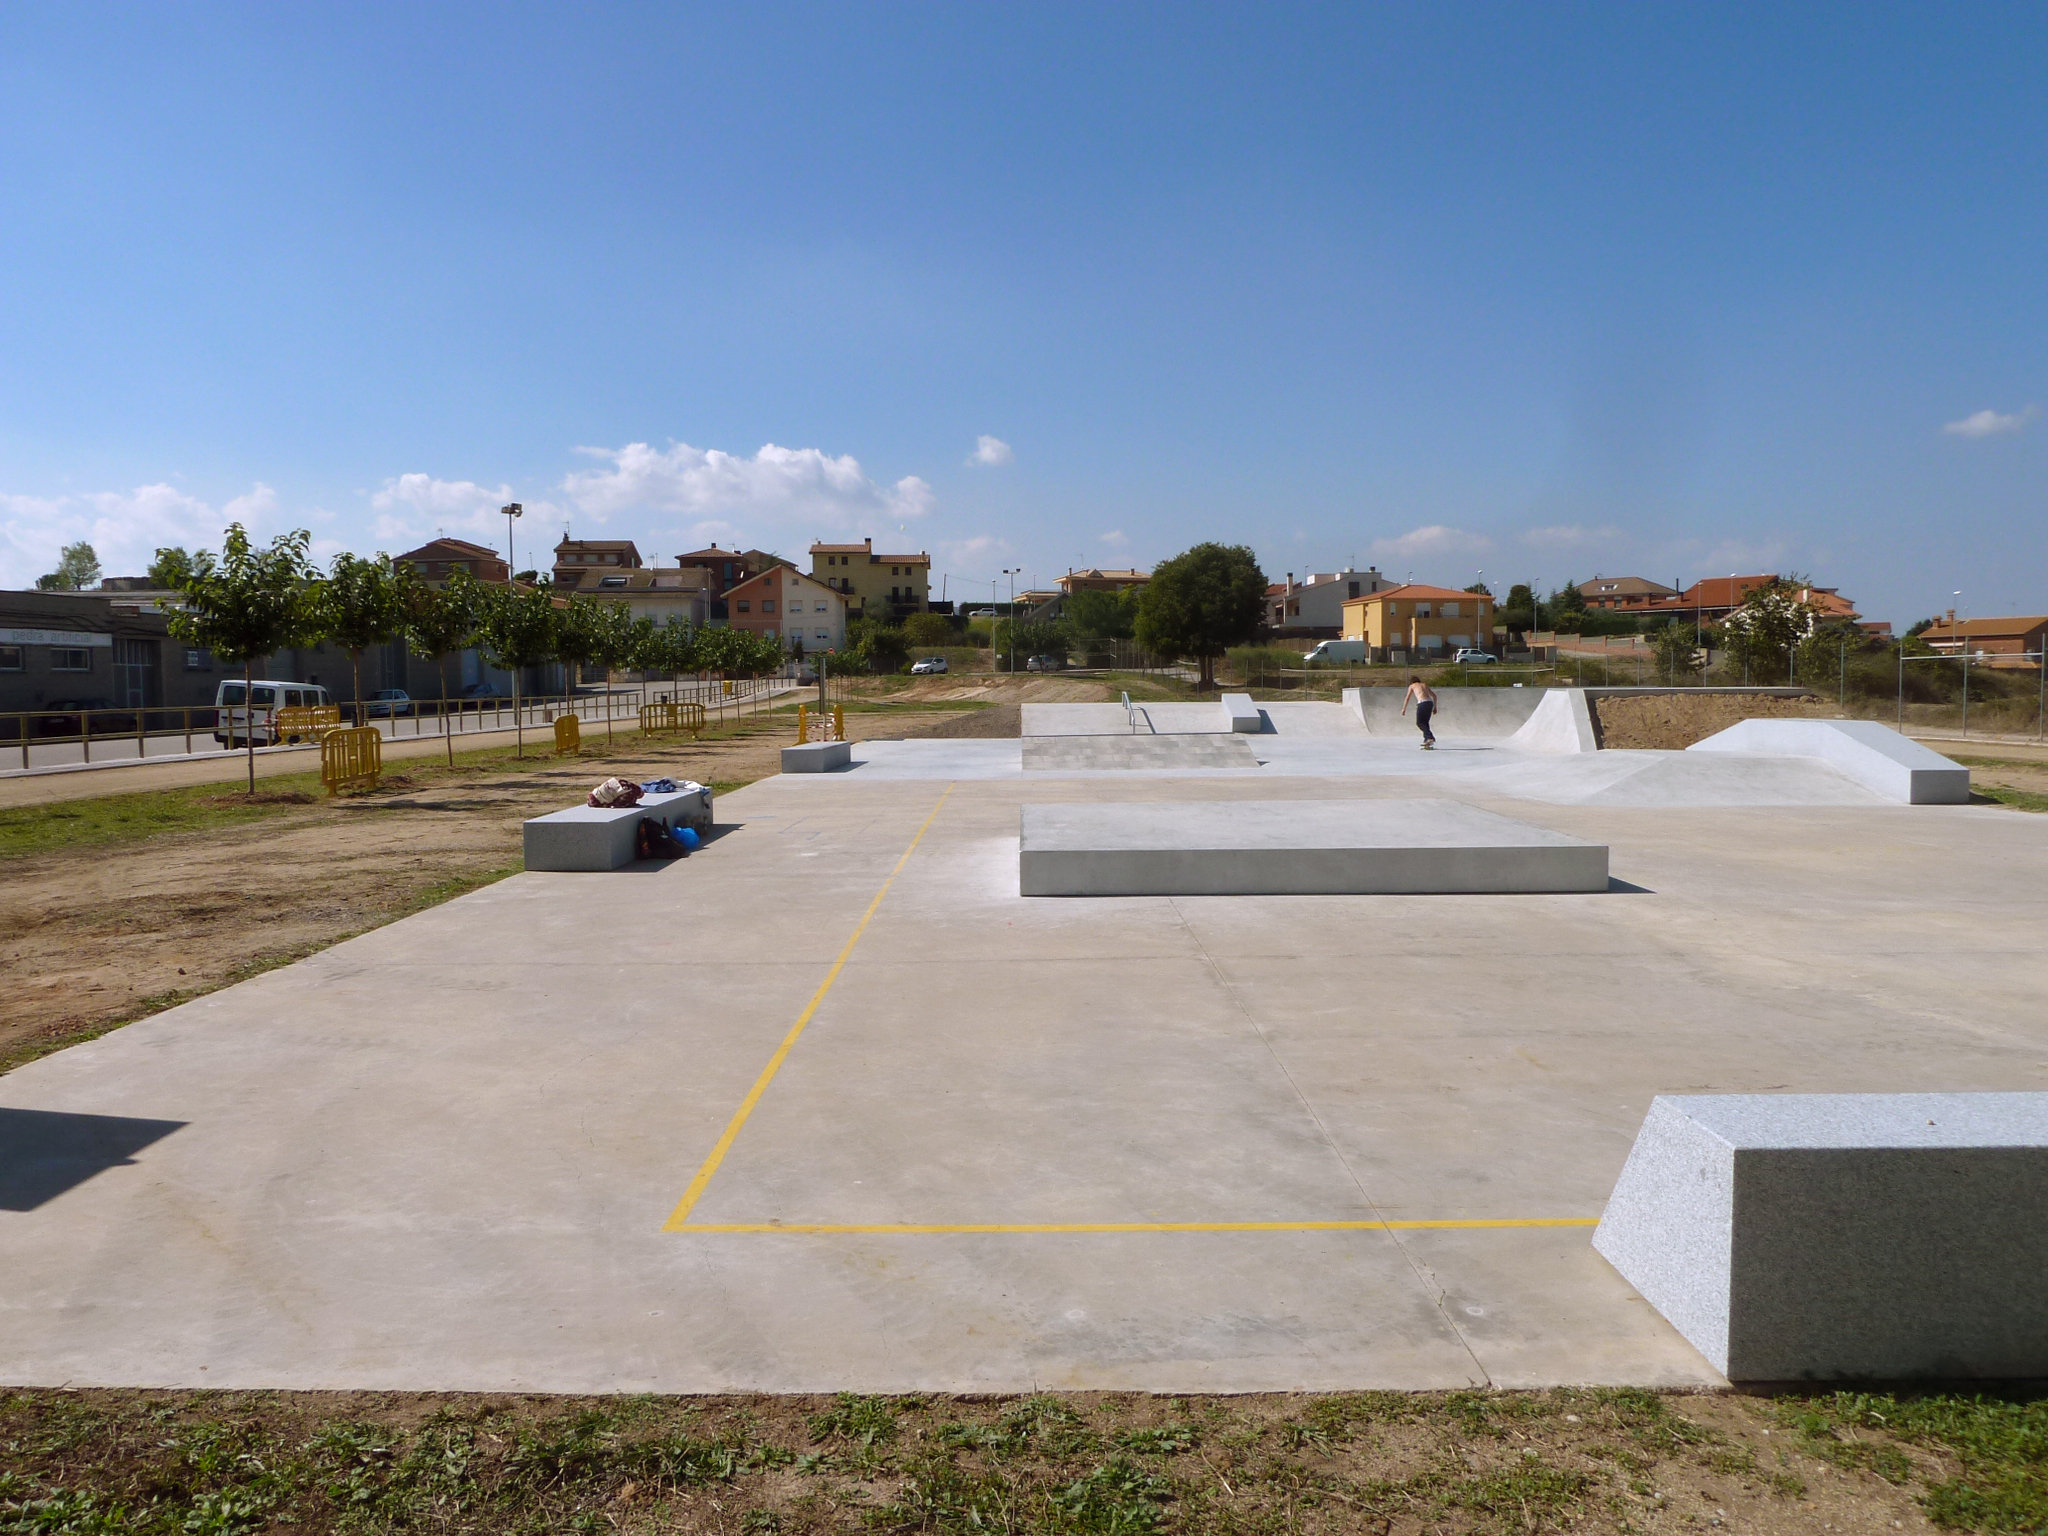 Skate-Architects-Navarcles-Skatepark-Skateplaza-02-AAP1120708.jpg